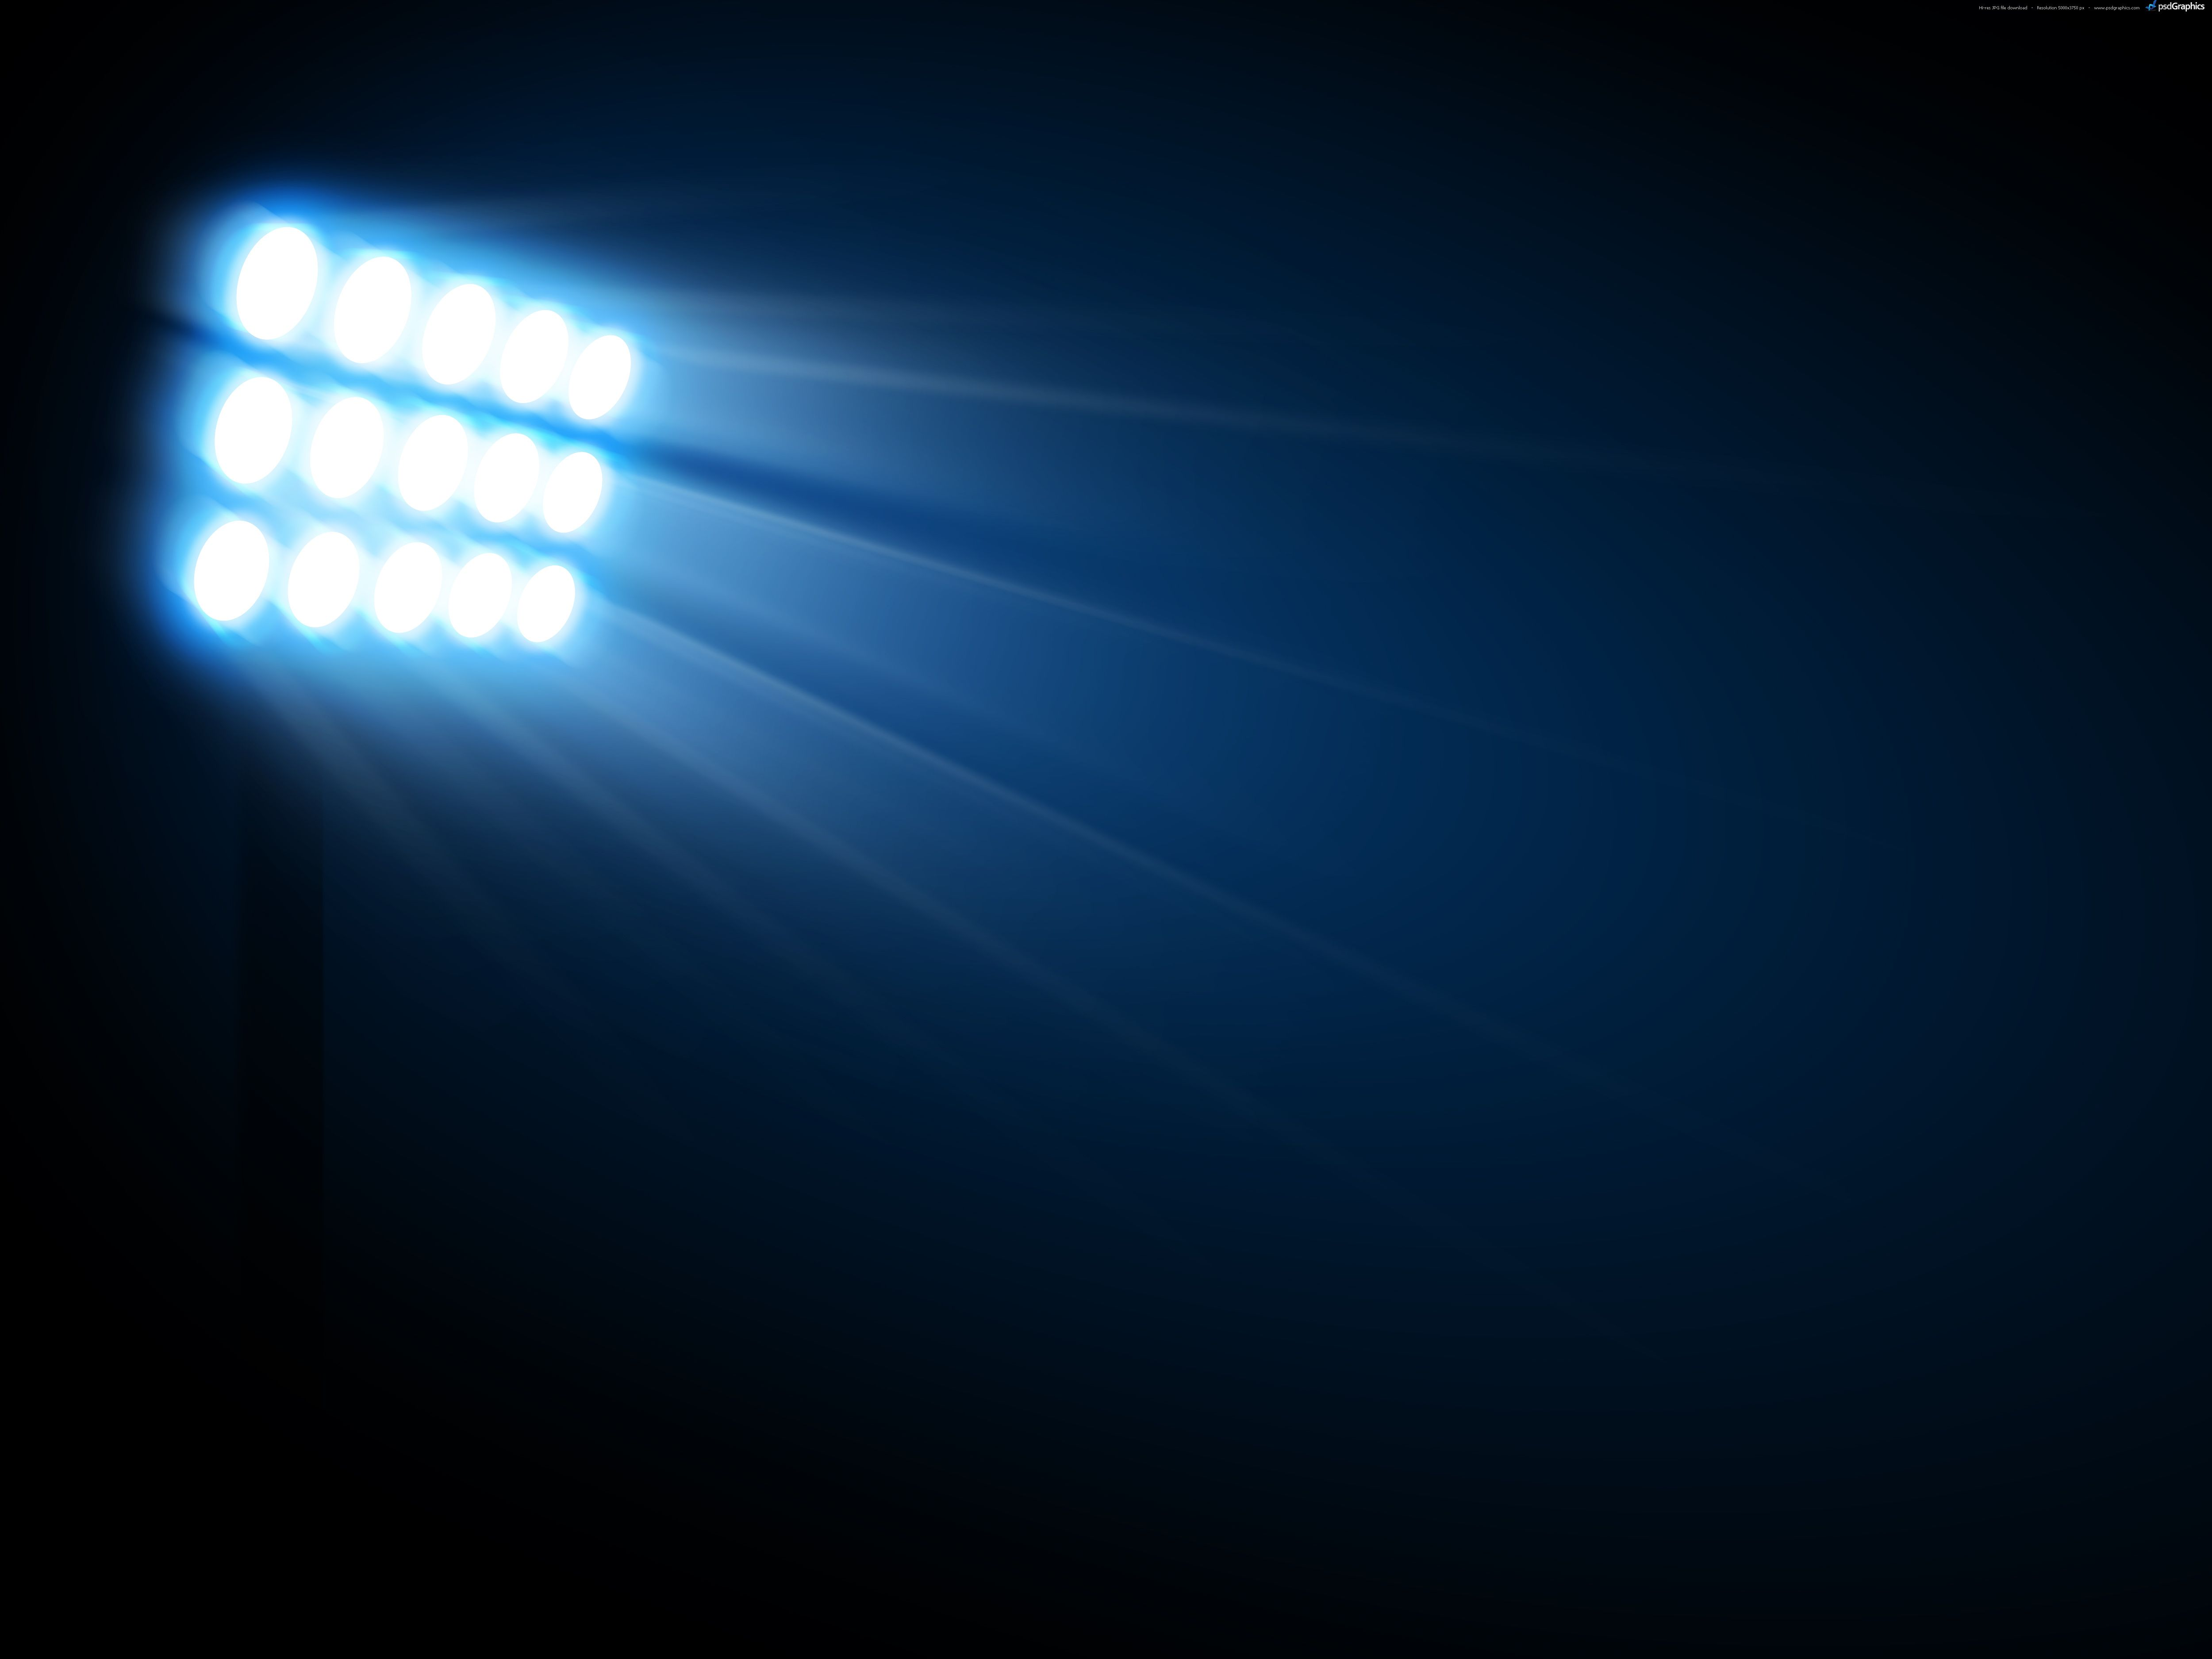 Beautiful Fantasy Lights Waves Backgrounds Night Sky Stars Background Stadium Lighting Background Photo Background Images